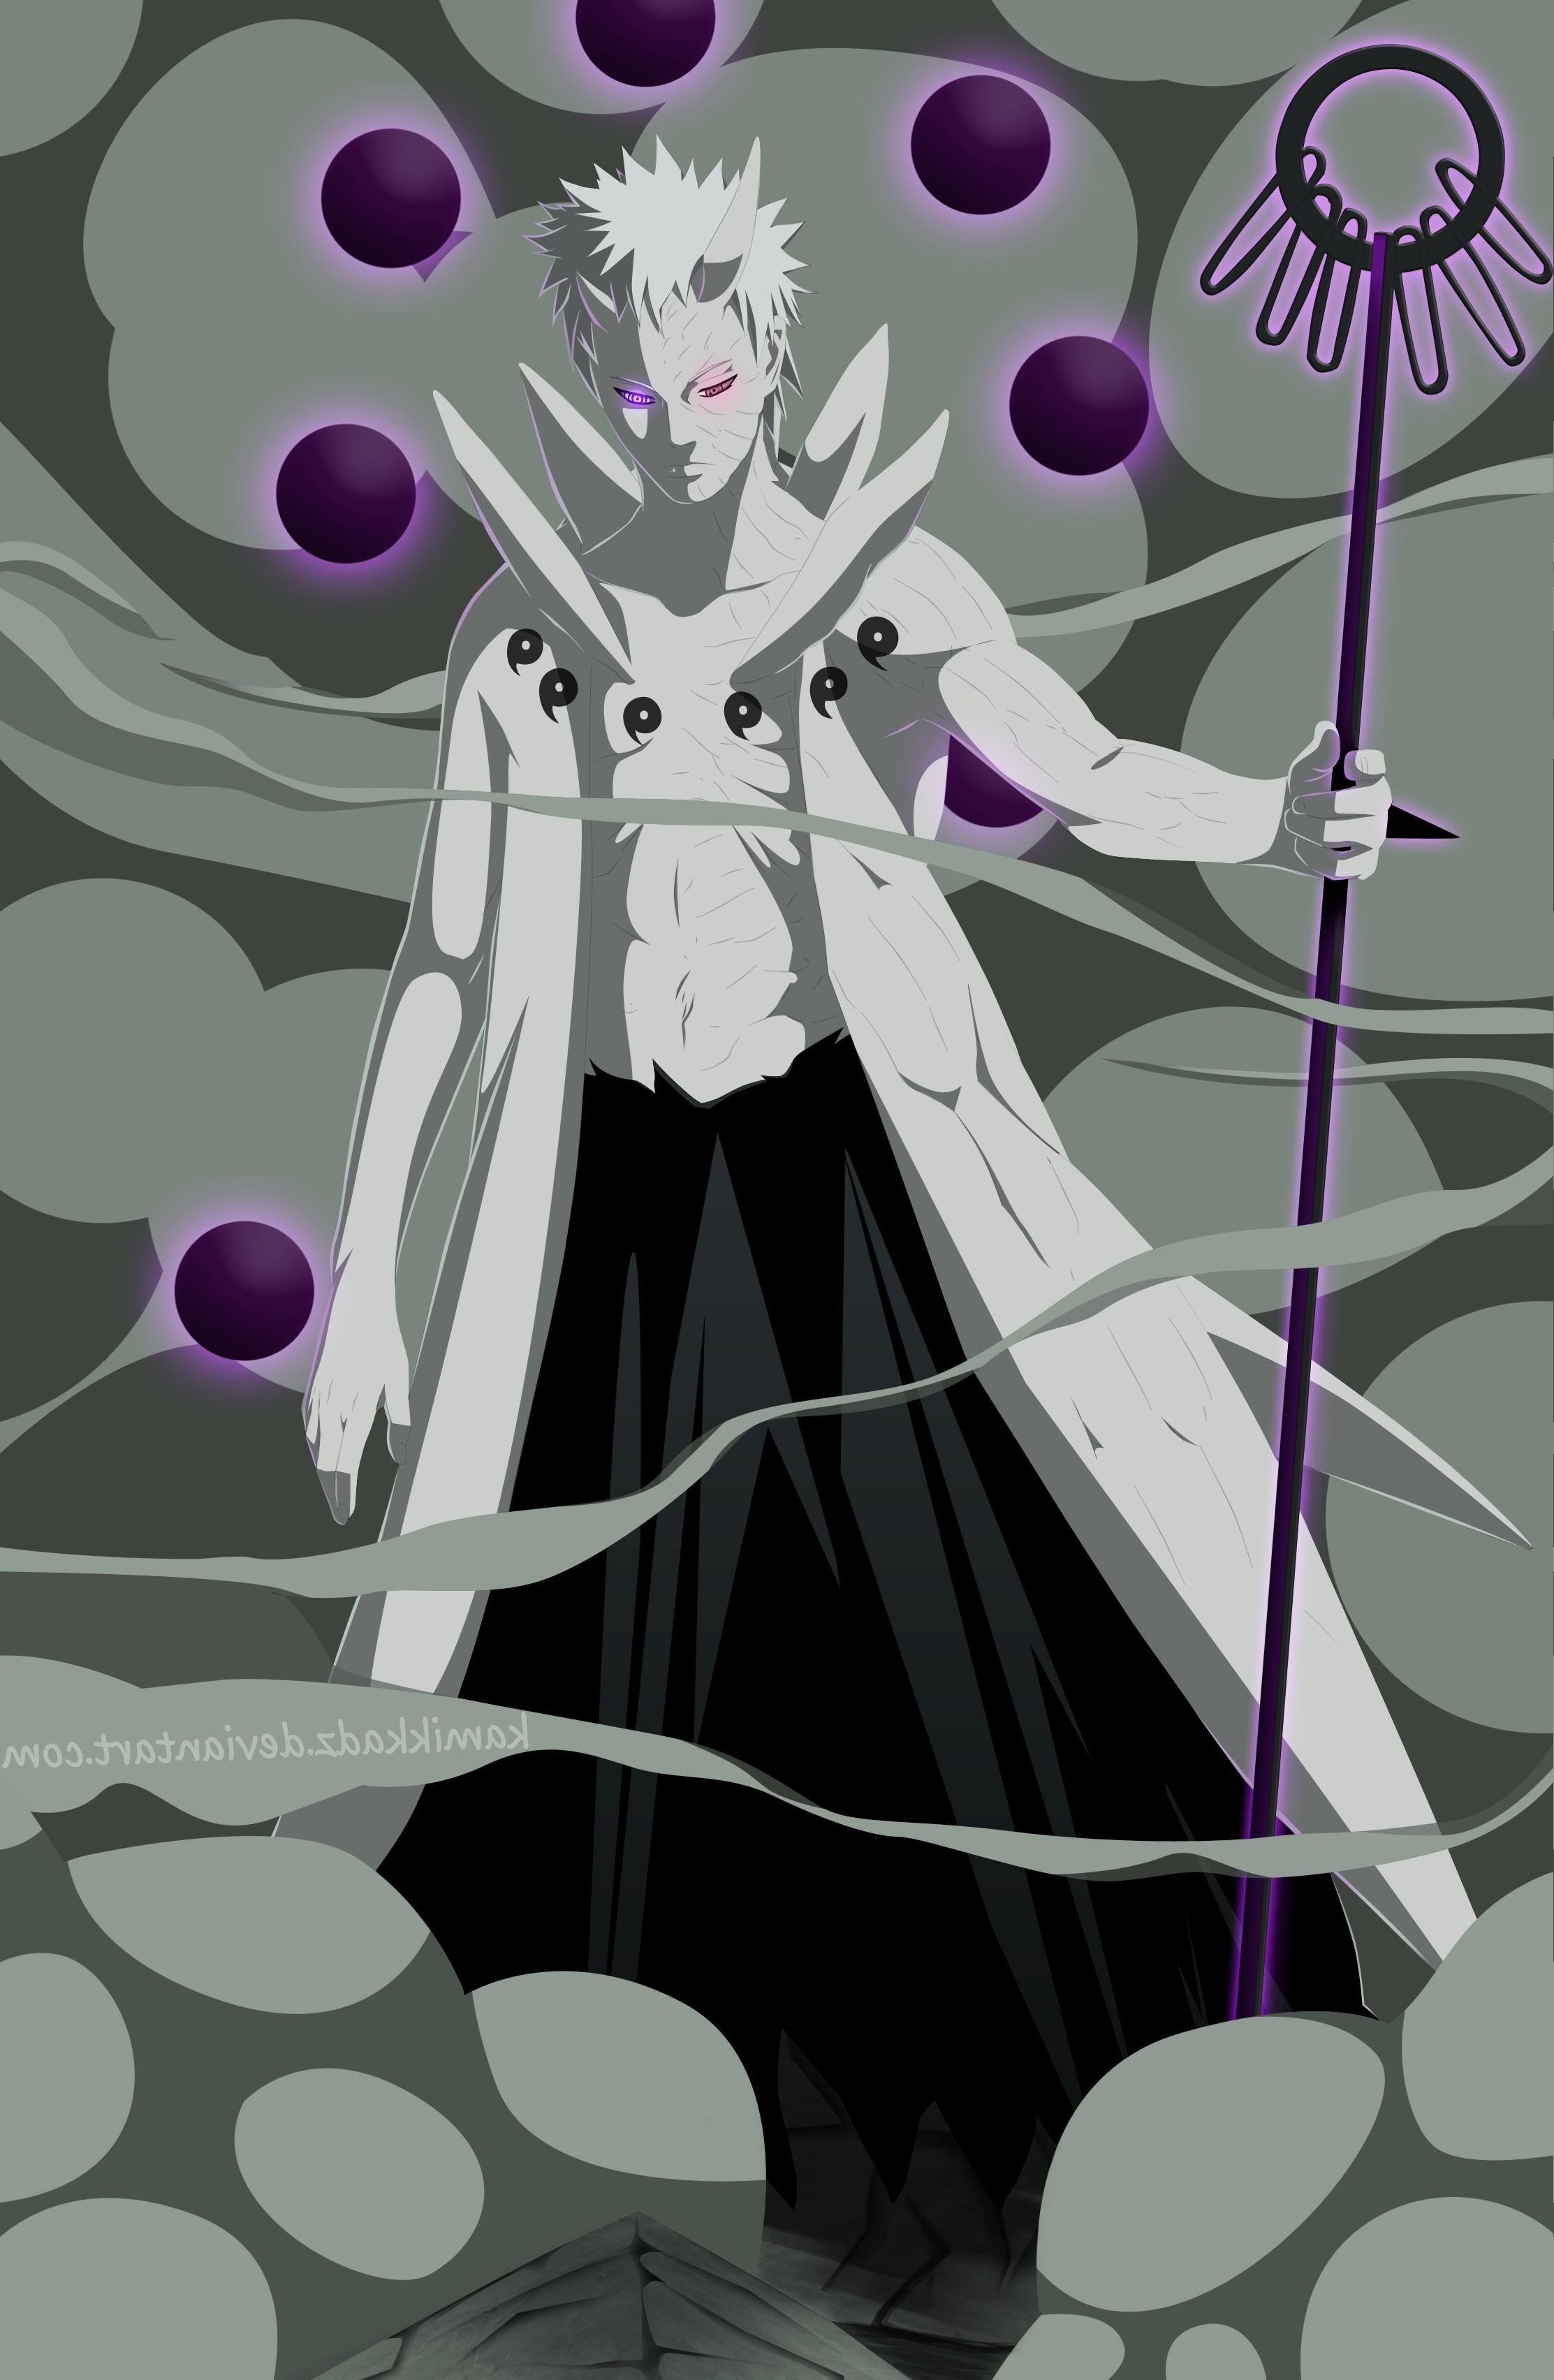 Good Wallpaper Naruto Purple - illustration-anime-artwork-purple-violet-black-hair-graphic-design-pattern-Naruto-Shippuuden-Uchiha-Obito-ART-design-graphics-computer-wallpaper-fictional-character-mangaka-2225x3408-px-visual-arts-cg-artwork-797092  Perfect Image Reference_142720.jpg